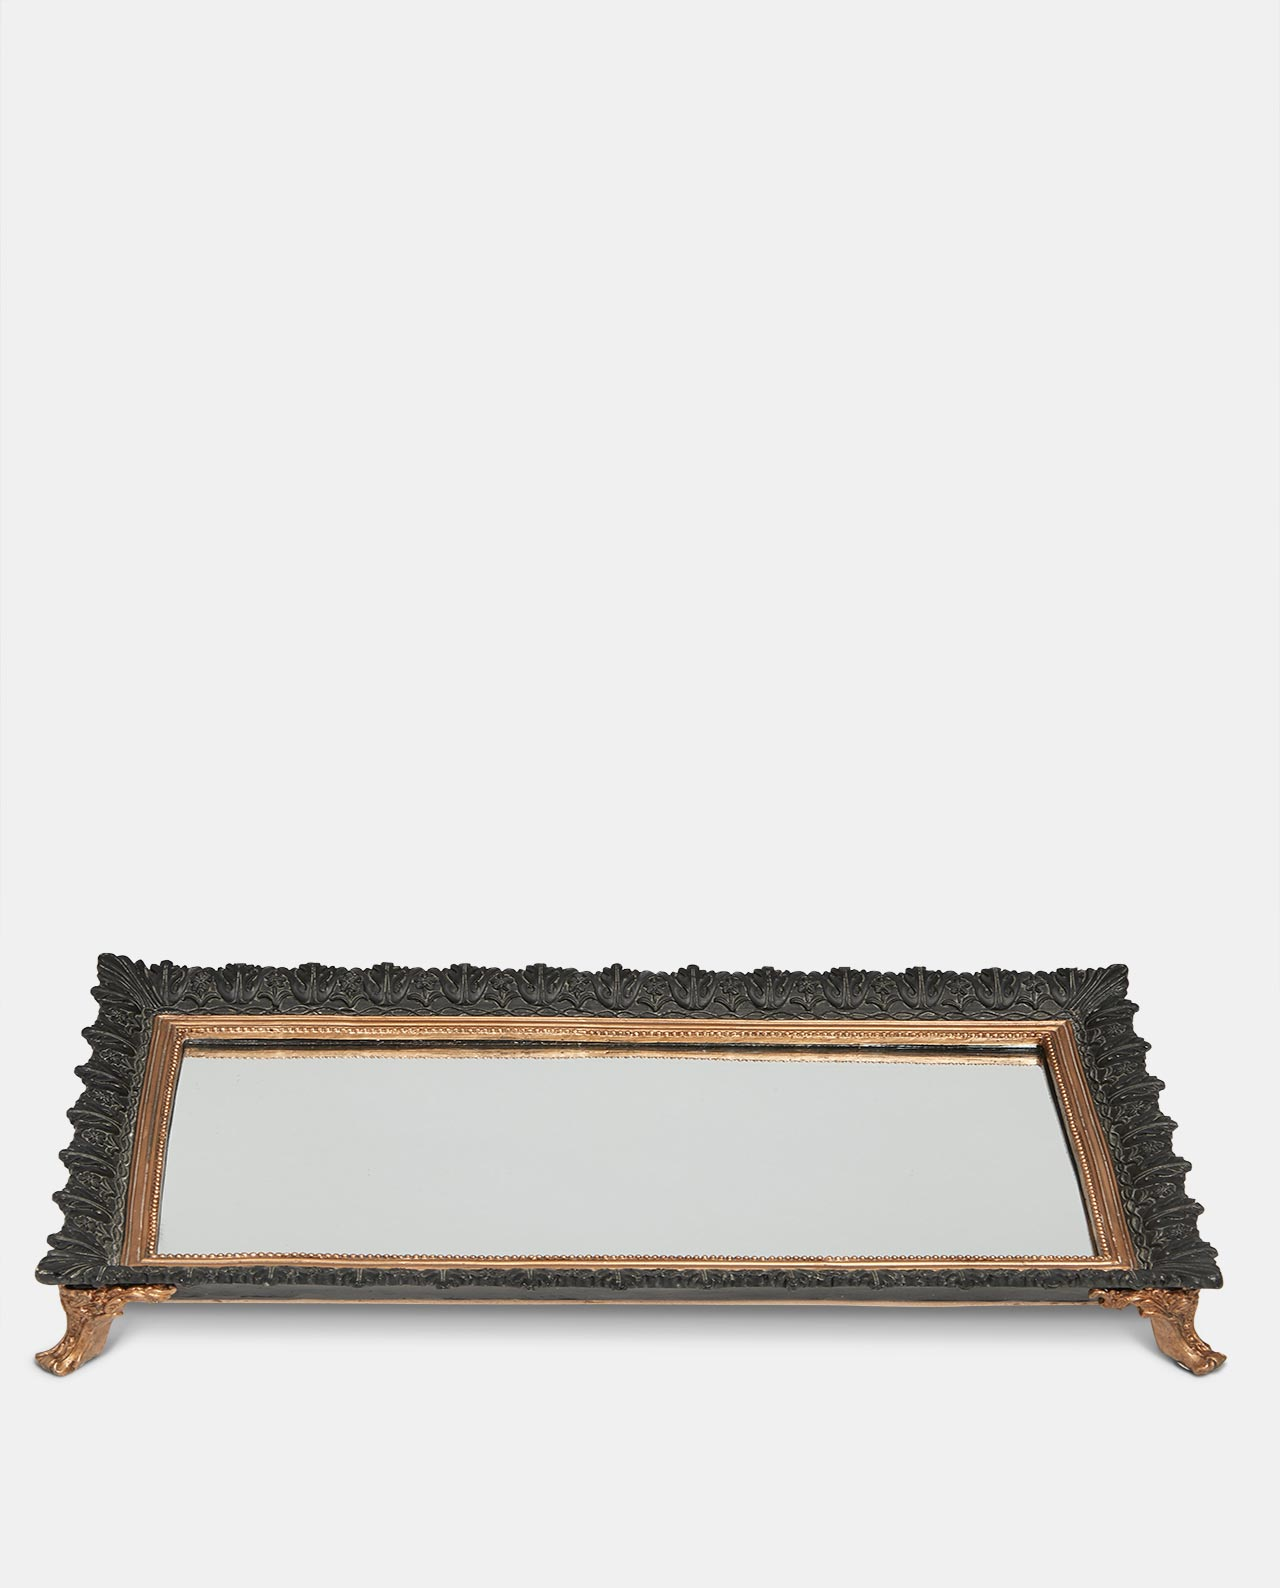 Black & Gold Mirrored Tray